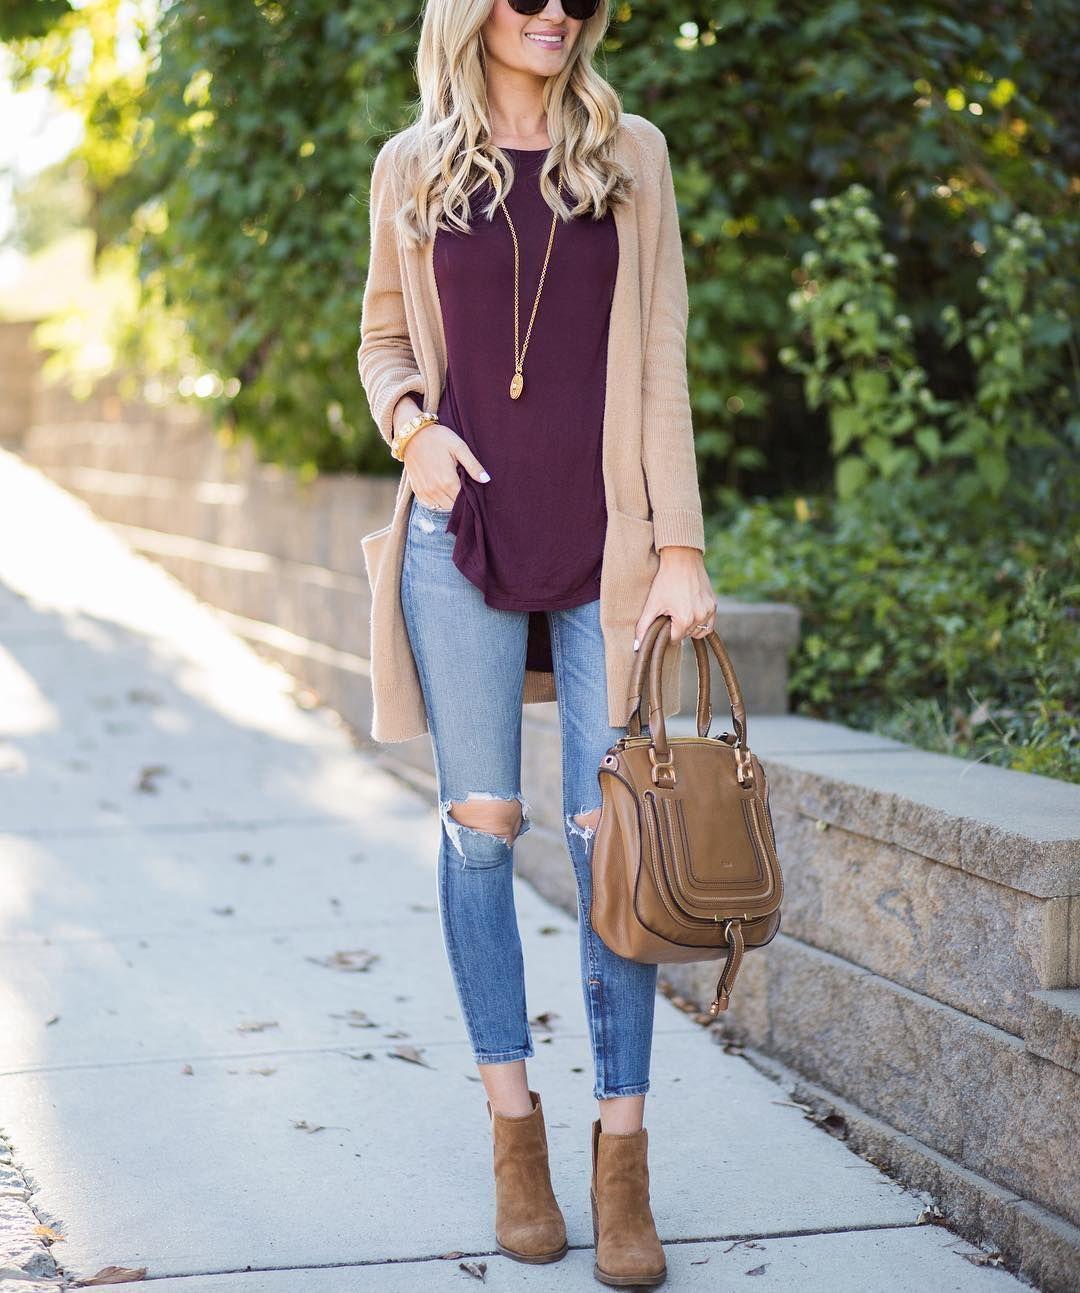 Color maravilloso moda Jeans Blusa vino Cardigan beige Botines Suéter  Beige 8f1d50d08f36